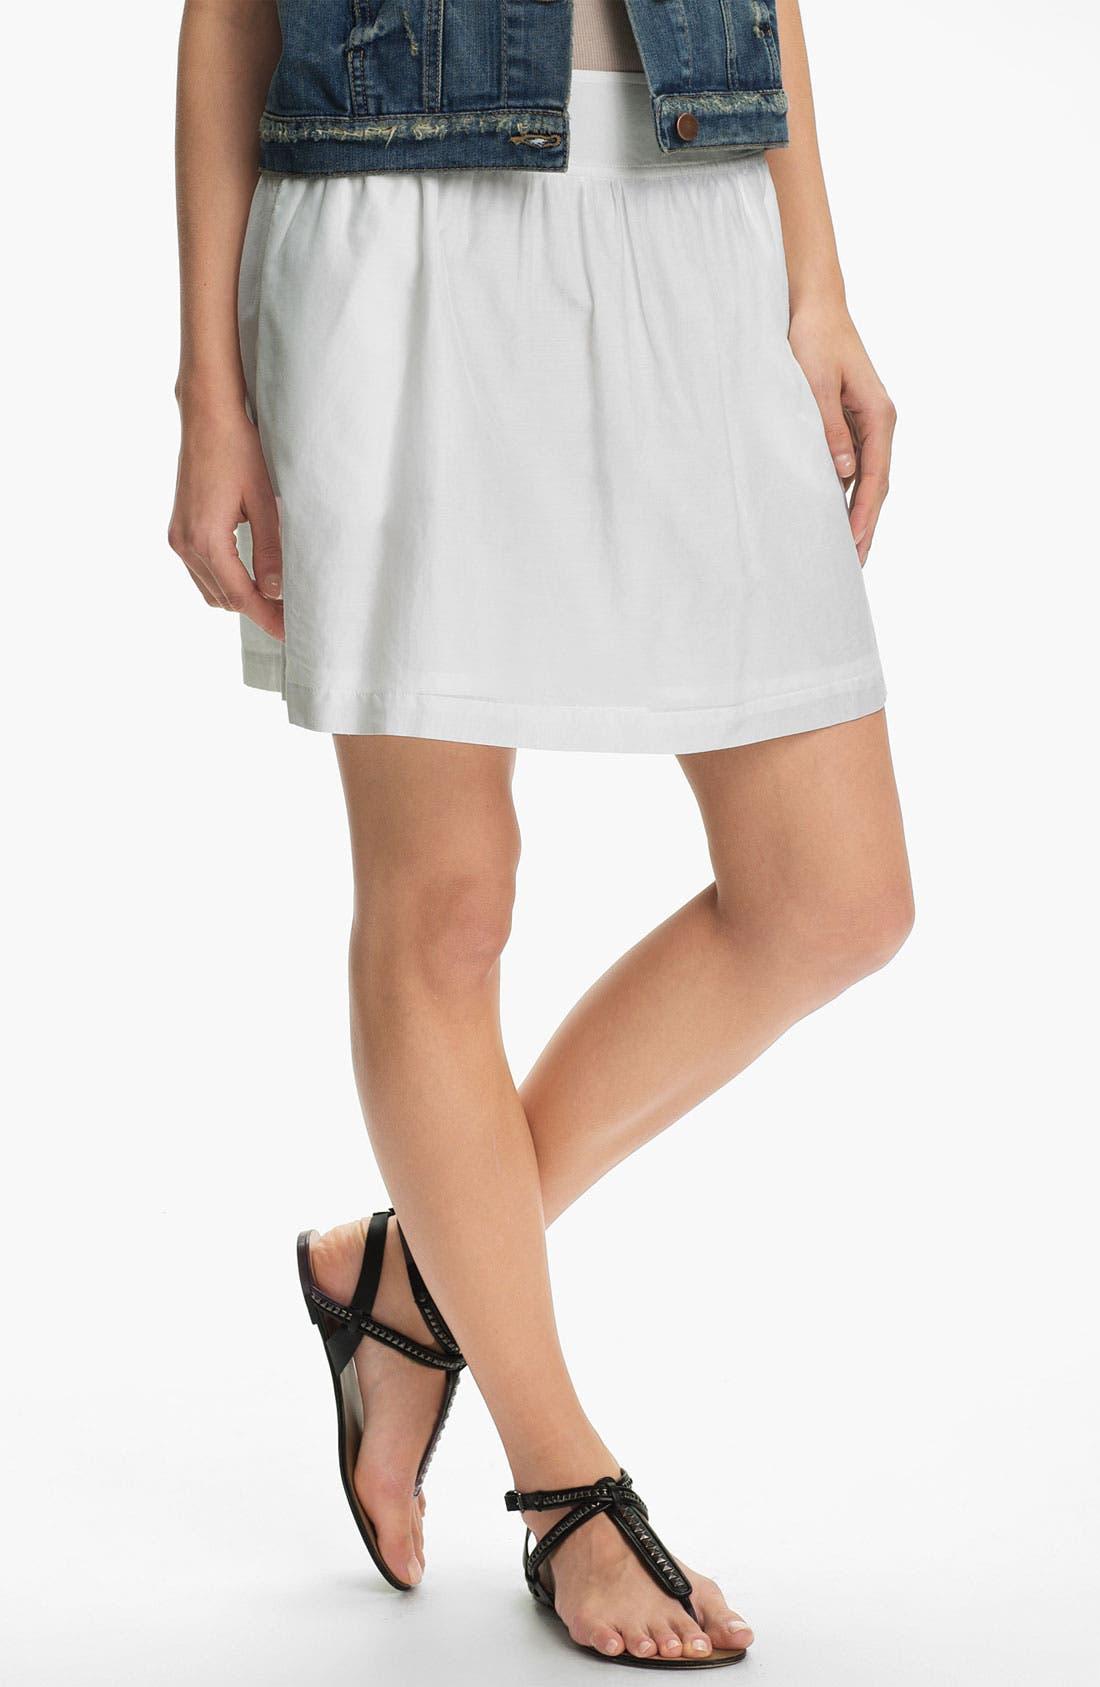 Alternate Image 1 Selected - Caslon Gathered Skirt